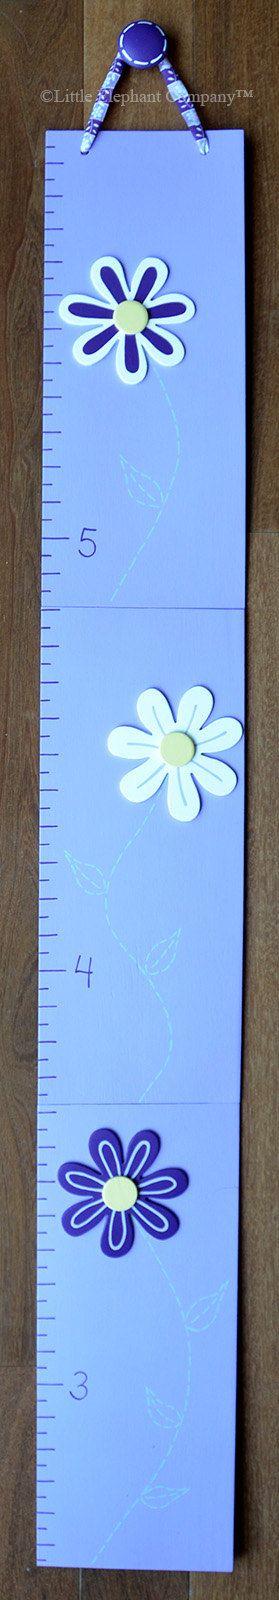 Harper Daisies Wooden Growth Chart handpainted por LittleElephantCo